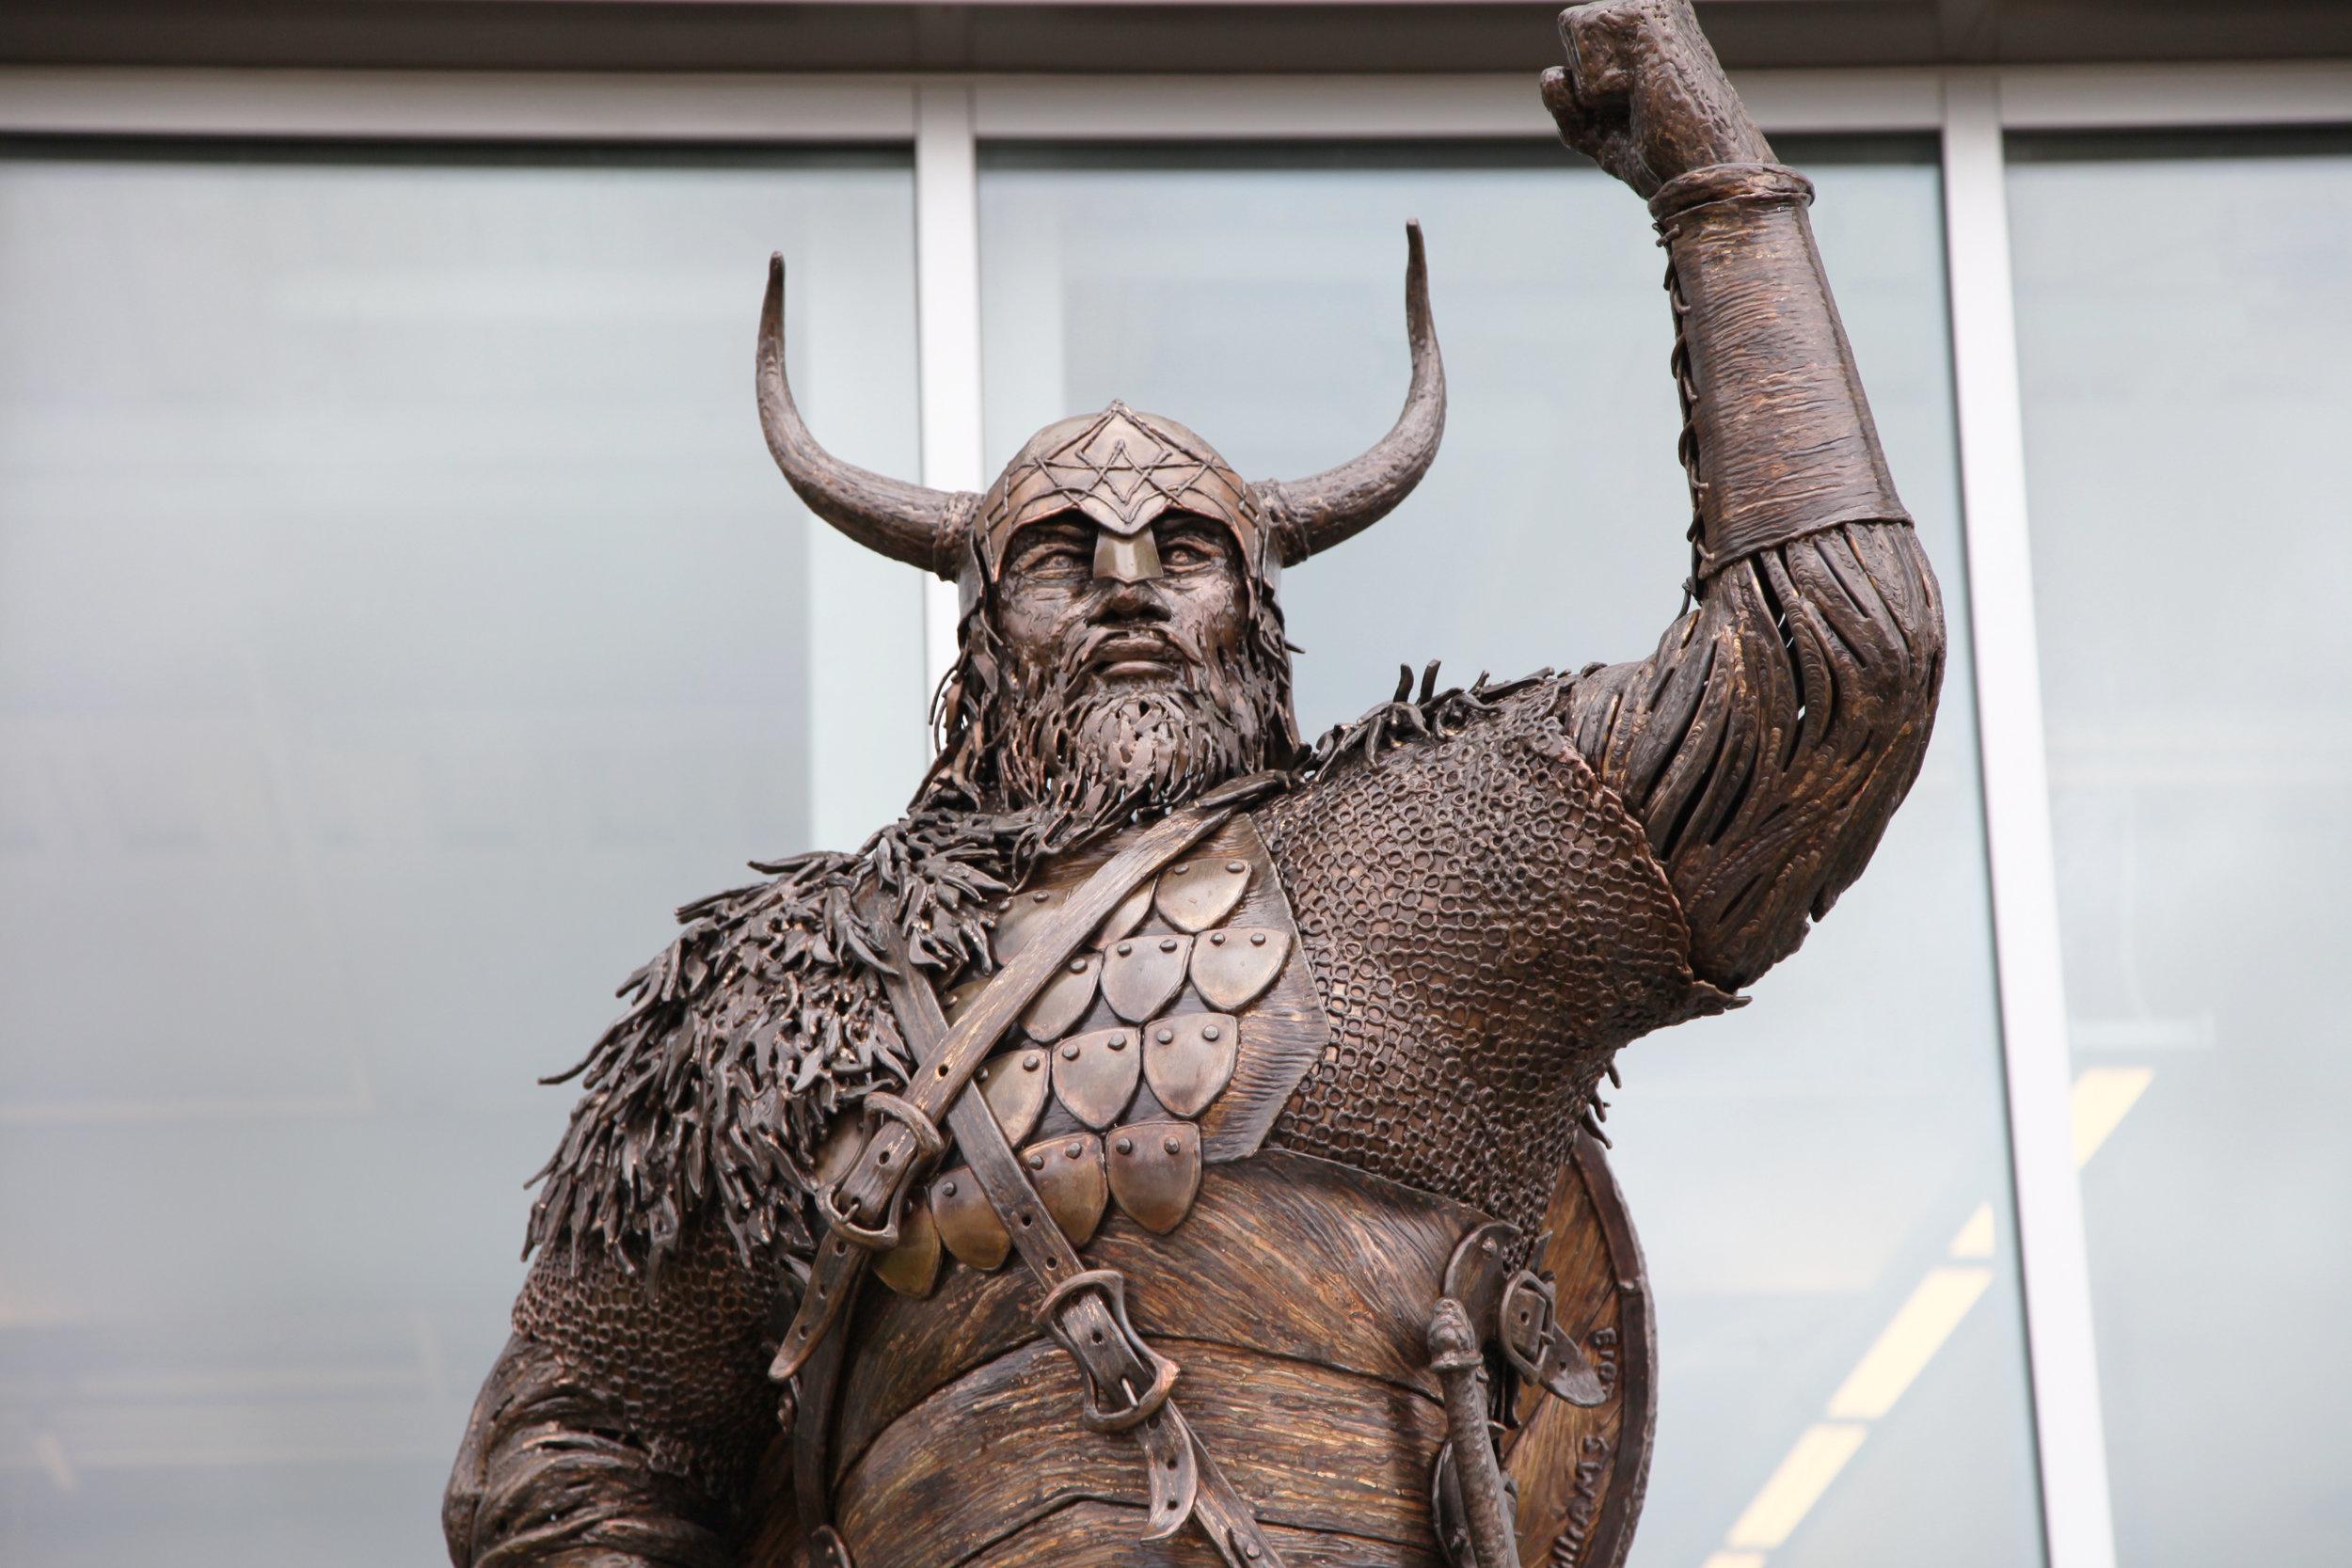 Viking at Salem State Sculpture, Chris Williams